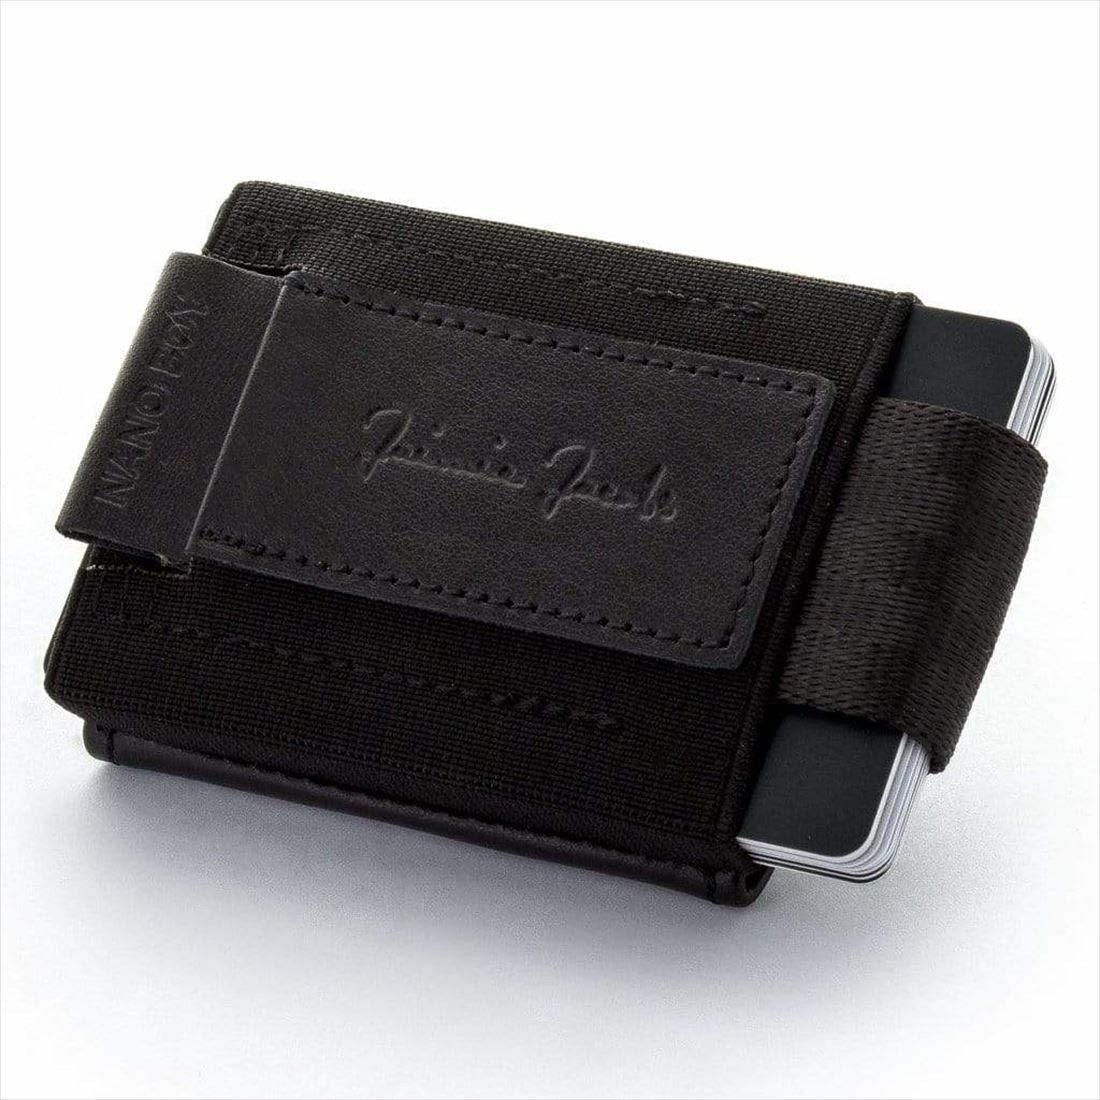 Jaimie Jacobs NANO BOY POCKET コンパクト財布 ( マネークリップ 小銭入れ カードケース ギフトボックス付き) ブラック 正規輸入品